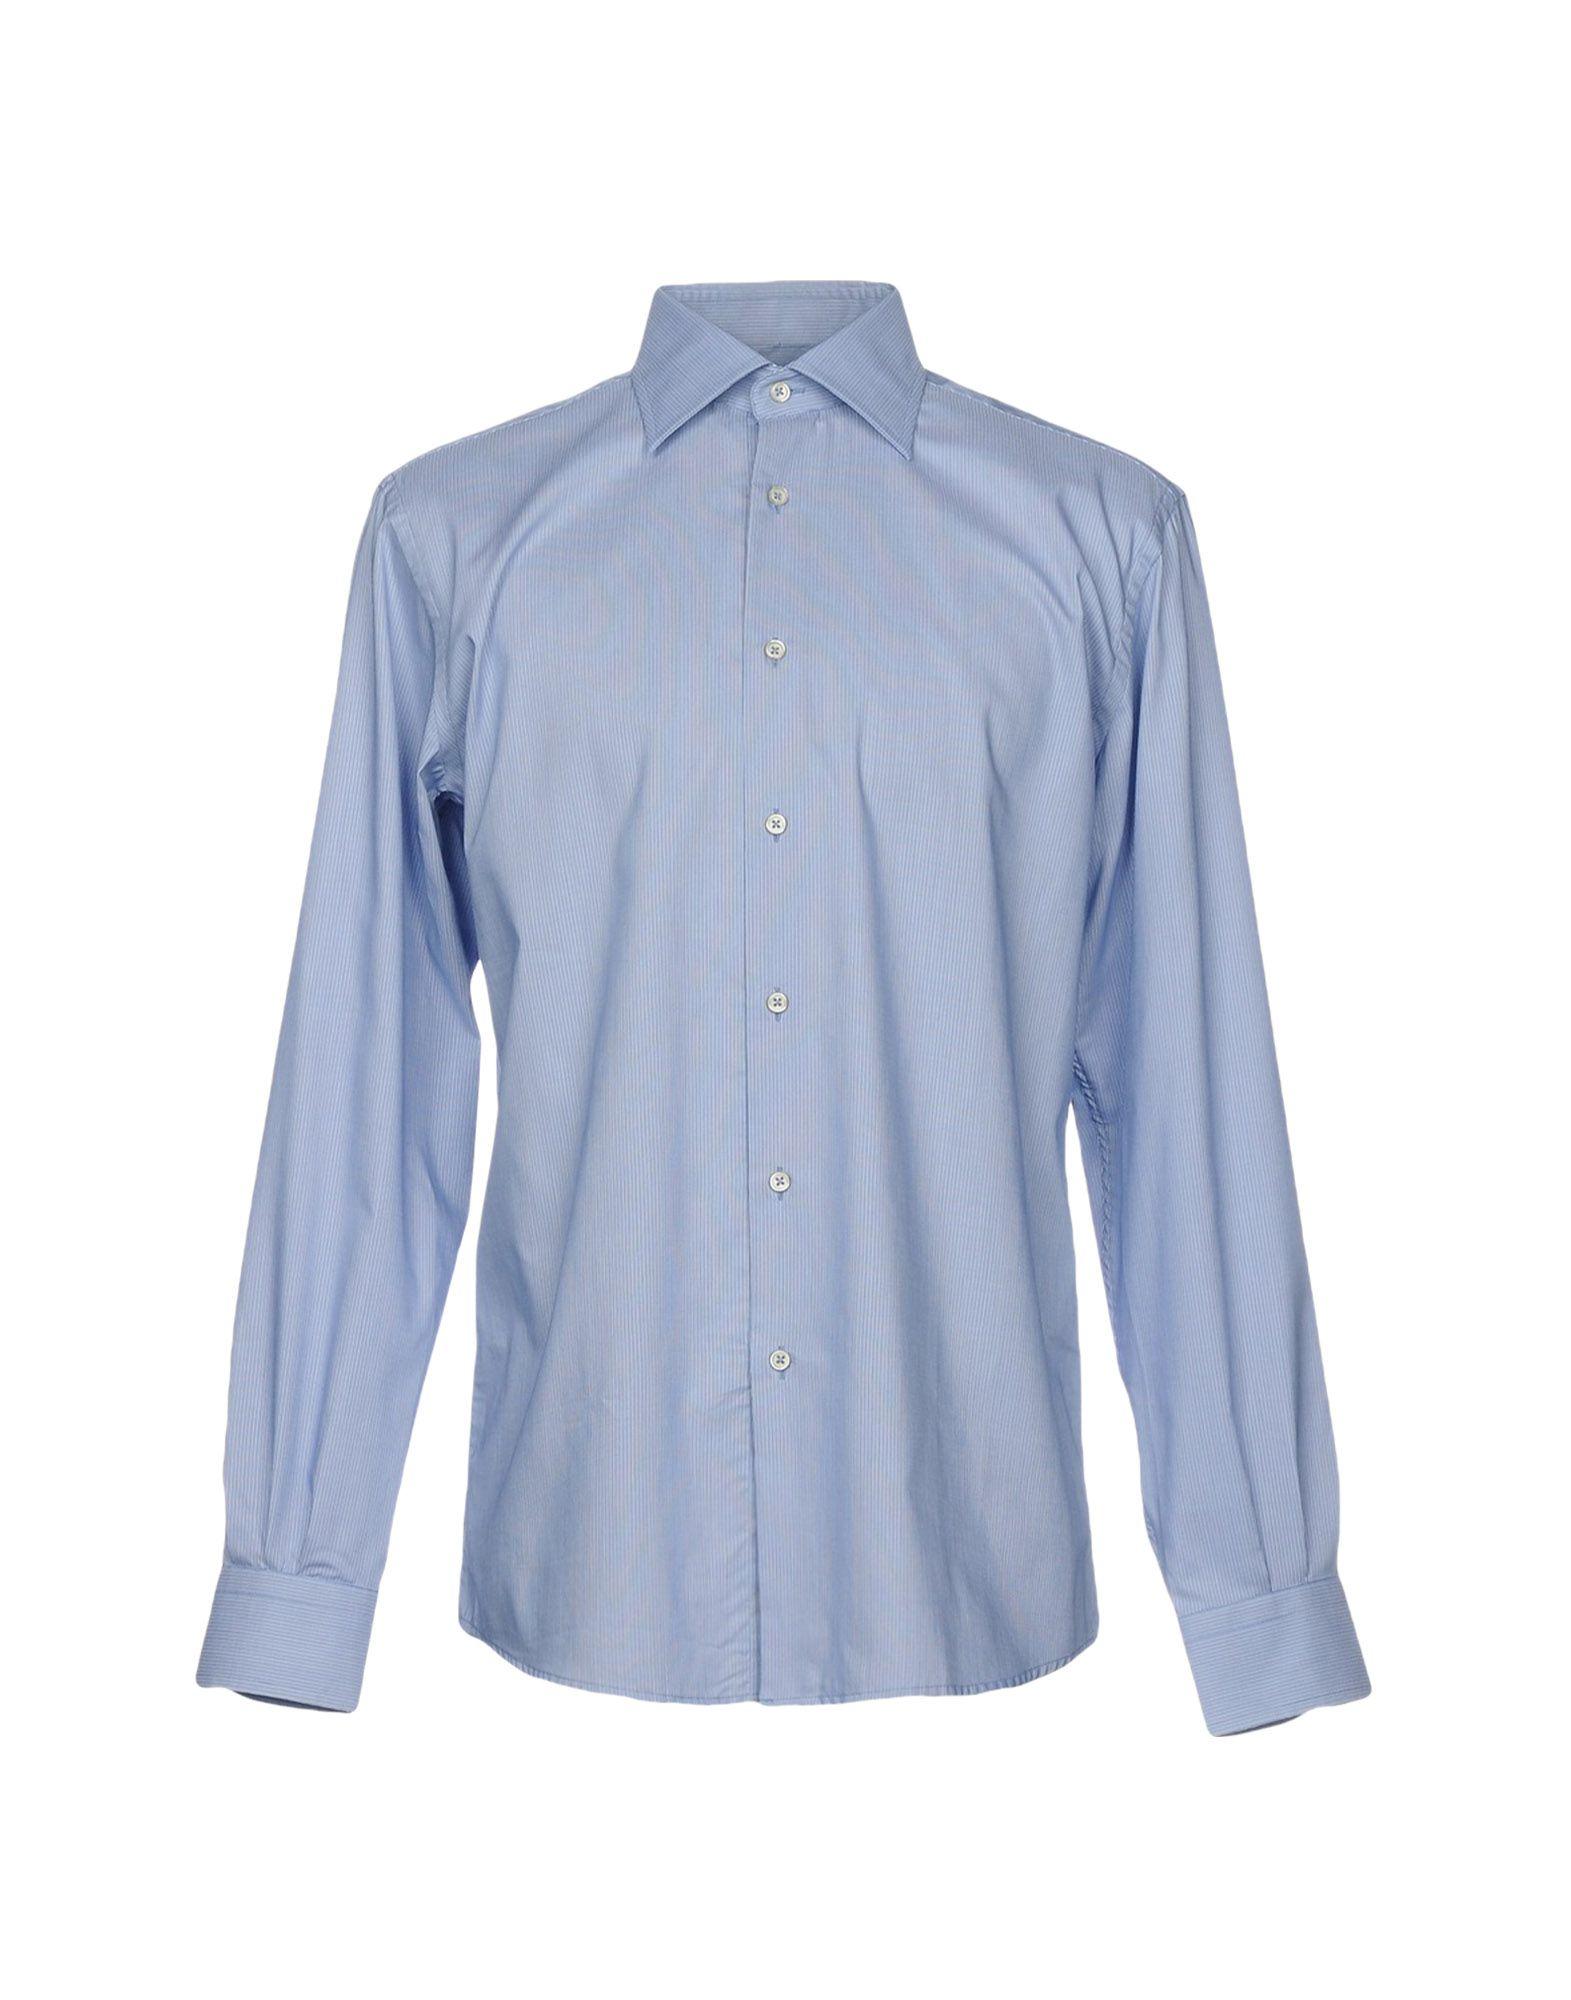 JEY COLE MAN Pубашка